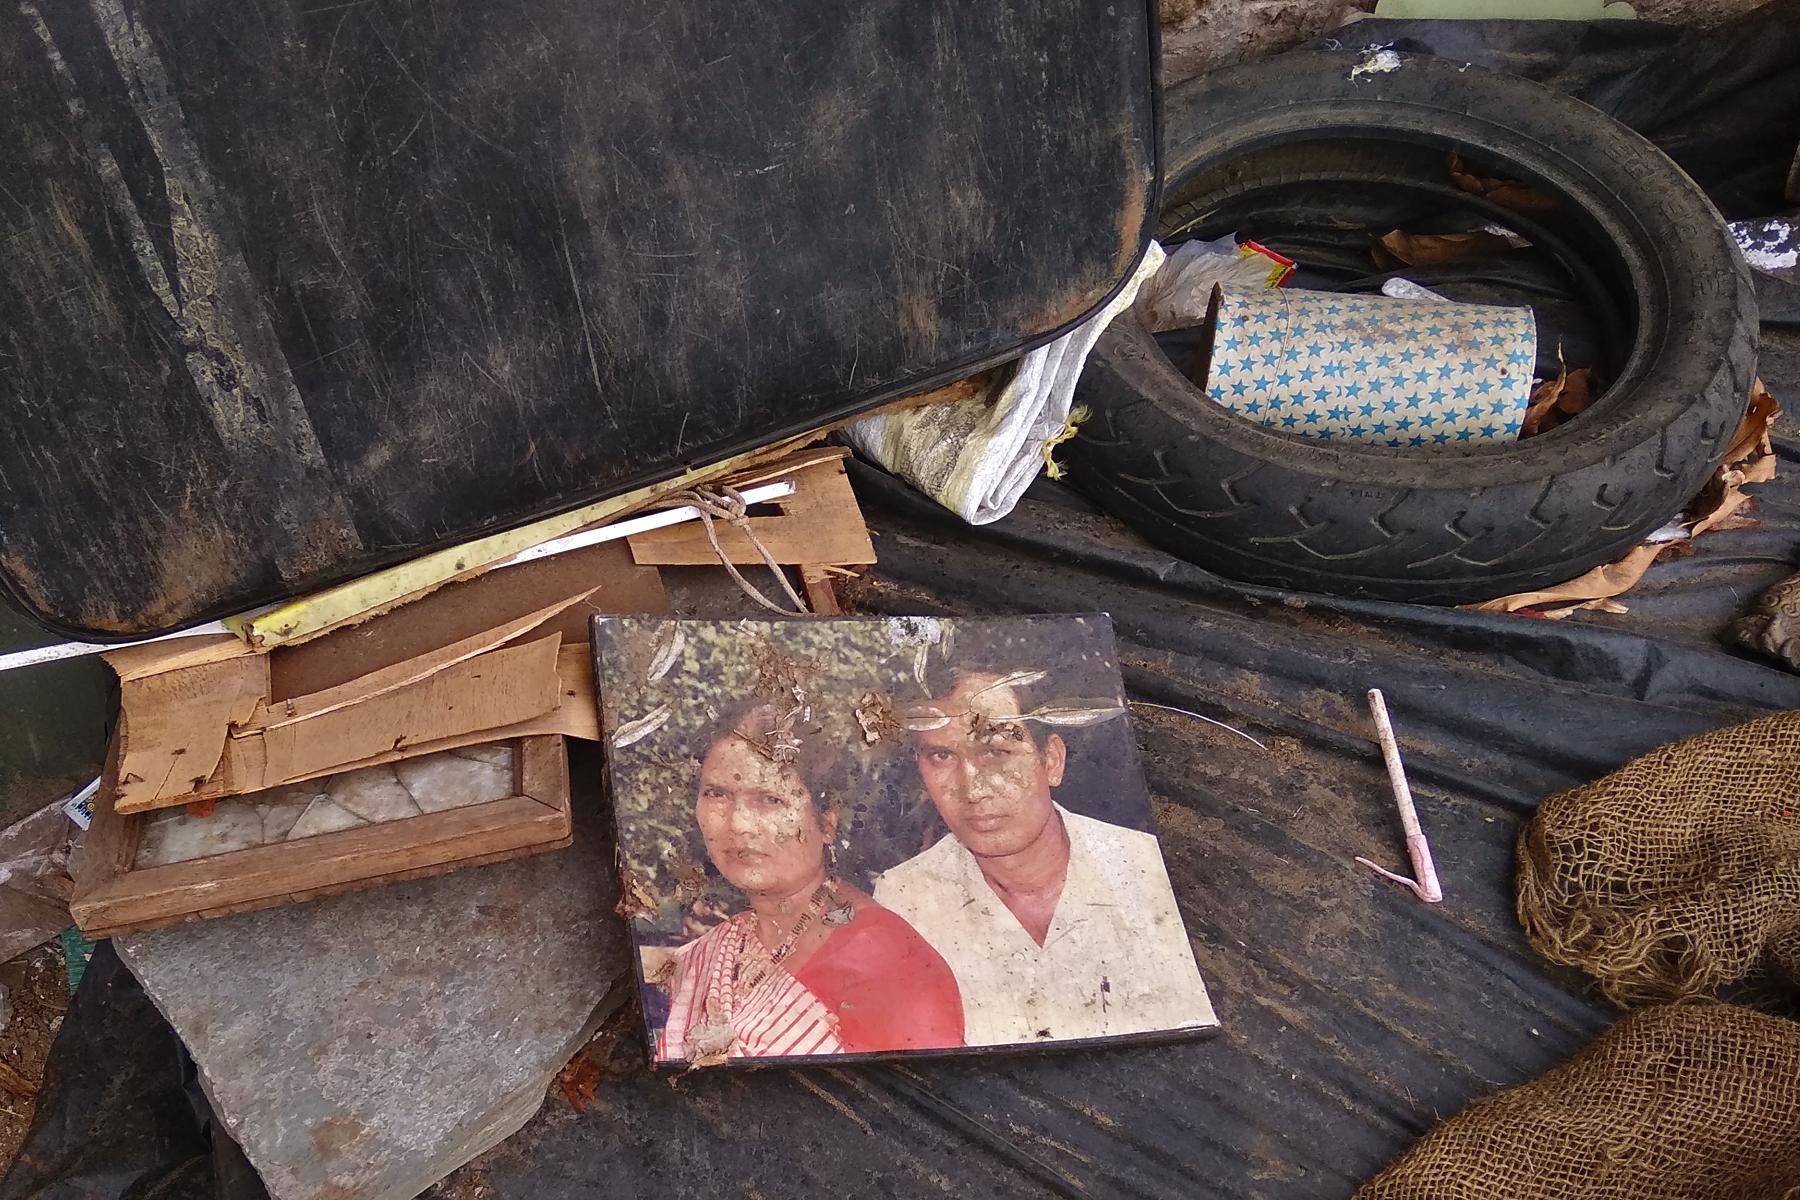 Beloved guardian old photo get lost in junkyard.